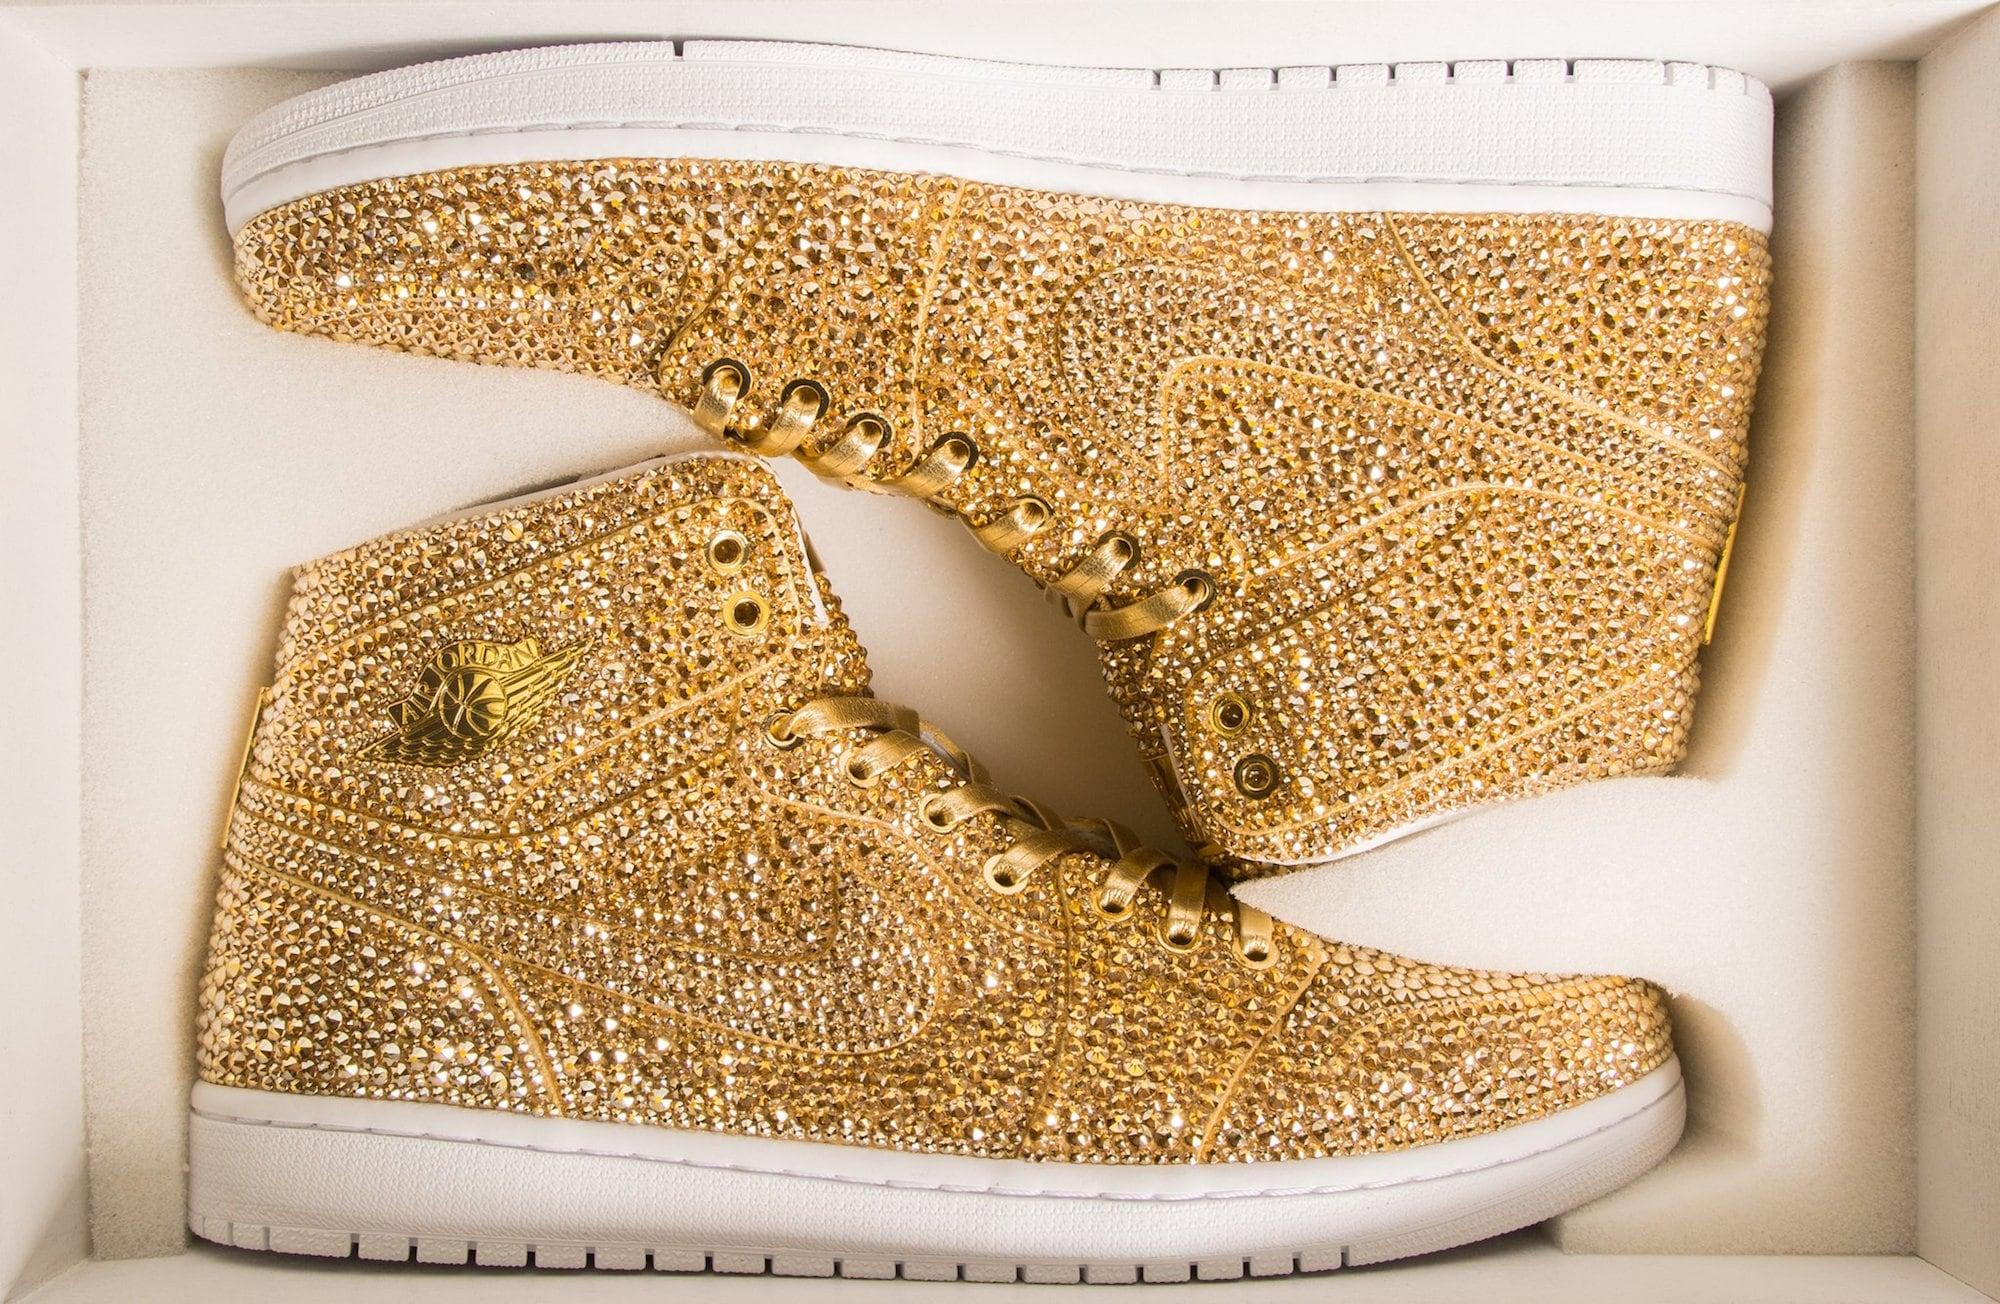 Daniel Jacob verziert Nike Air Jordans mit Swarovski Kristallen 4